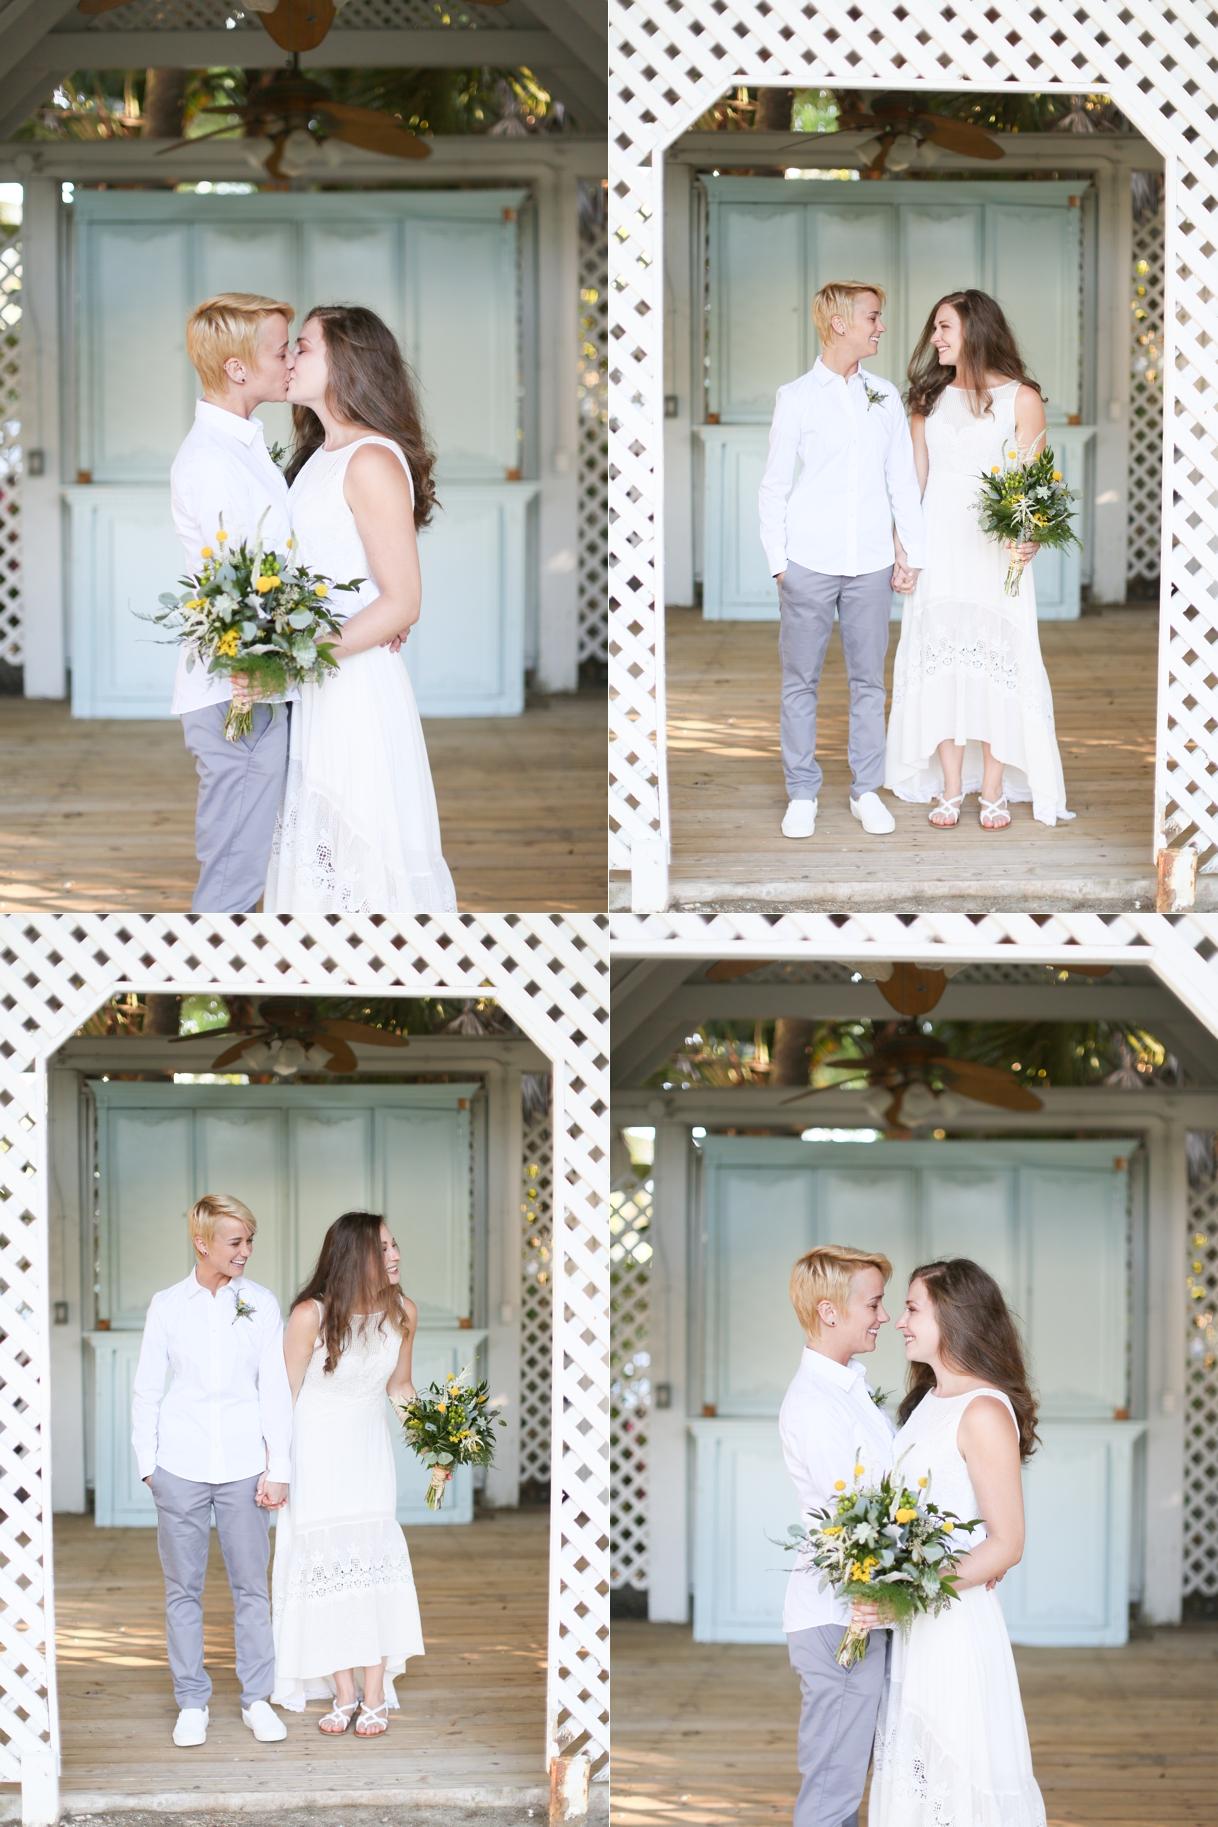 audreysnow-photography-casa-ybel-wedding_4443.jpg